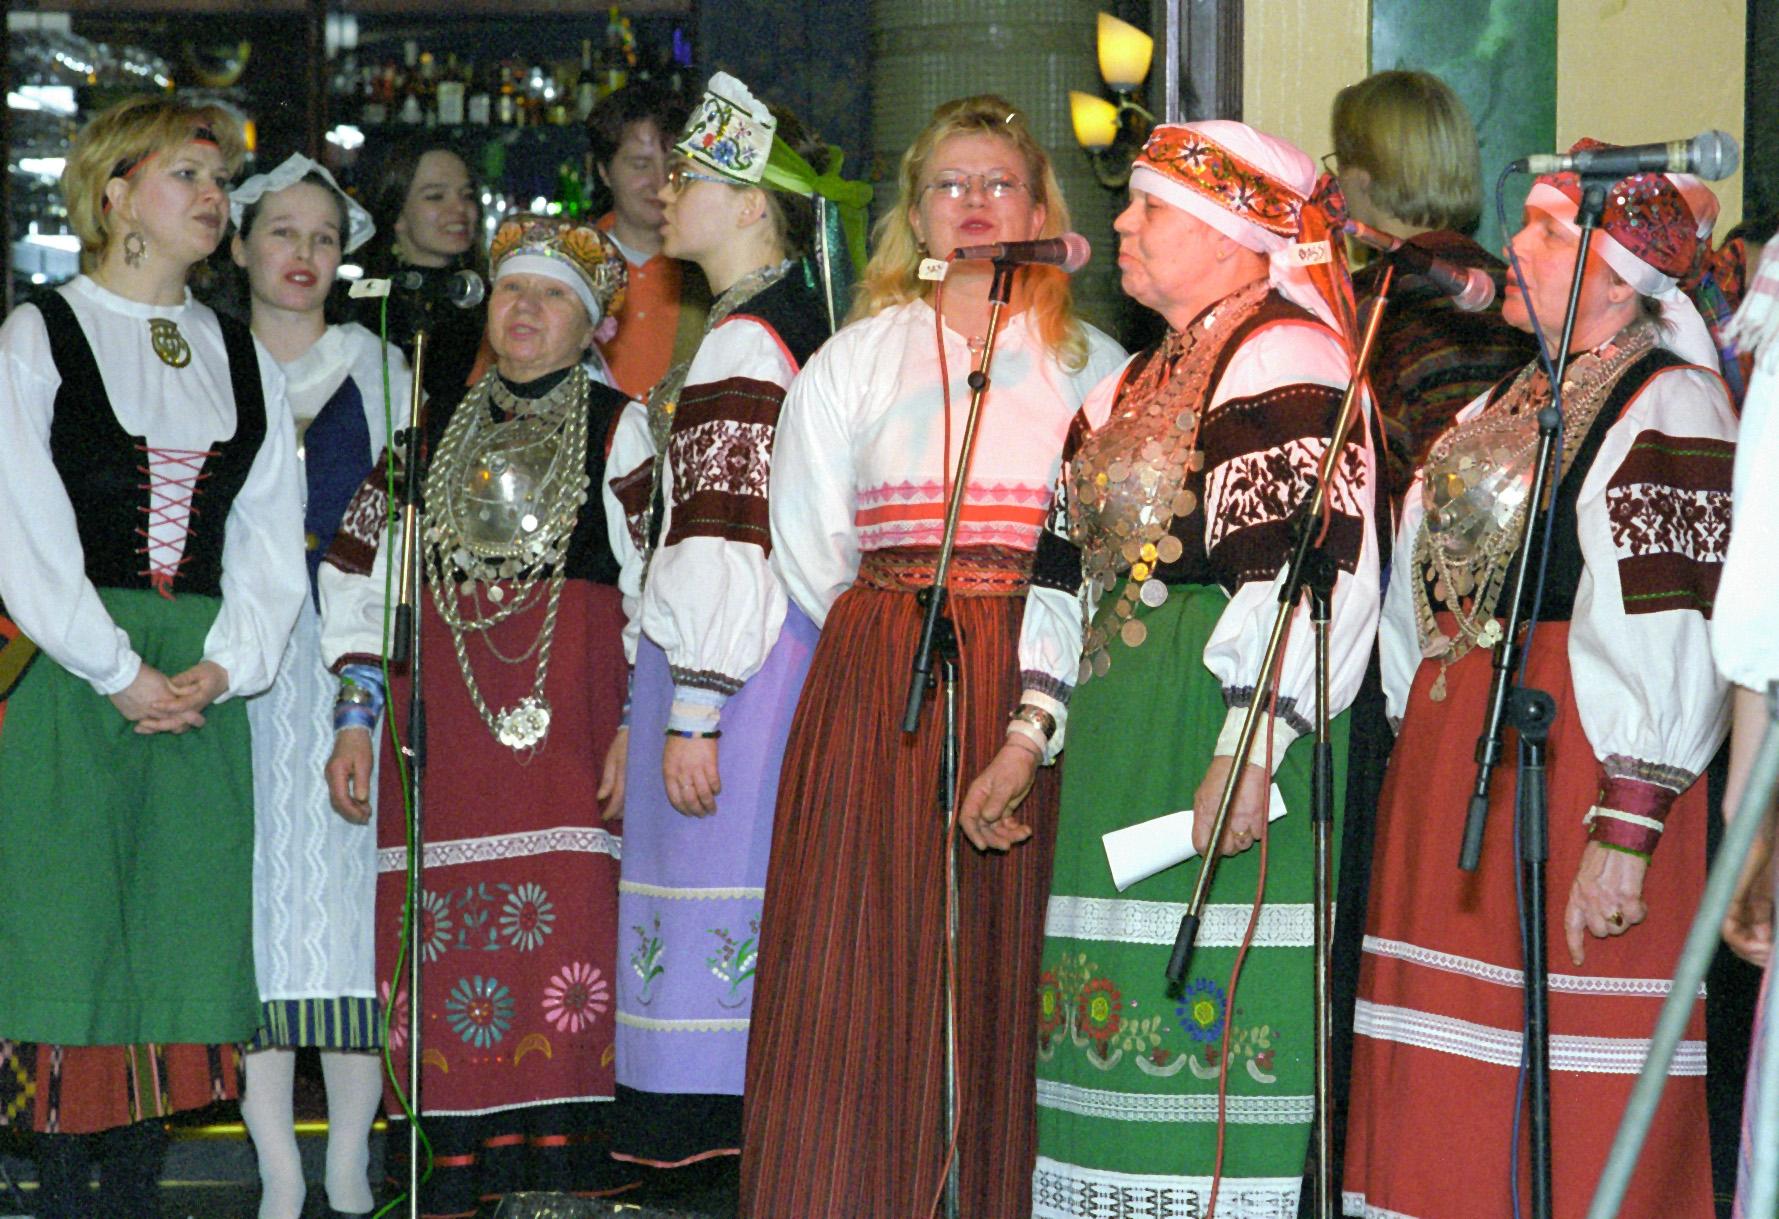 Viron setukaisia ja Menaisia